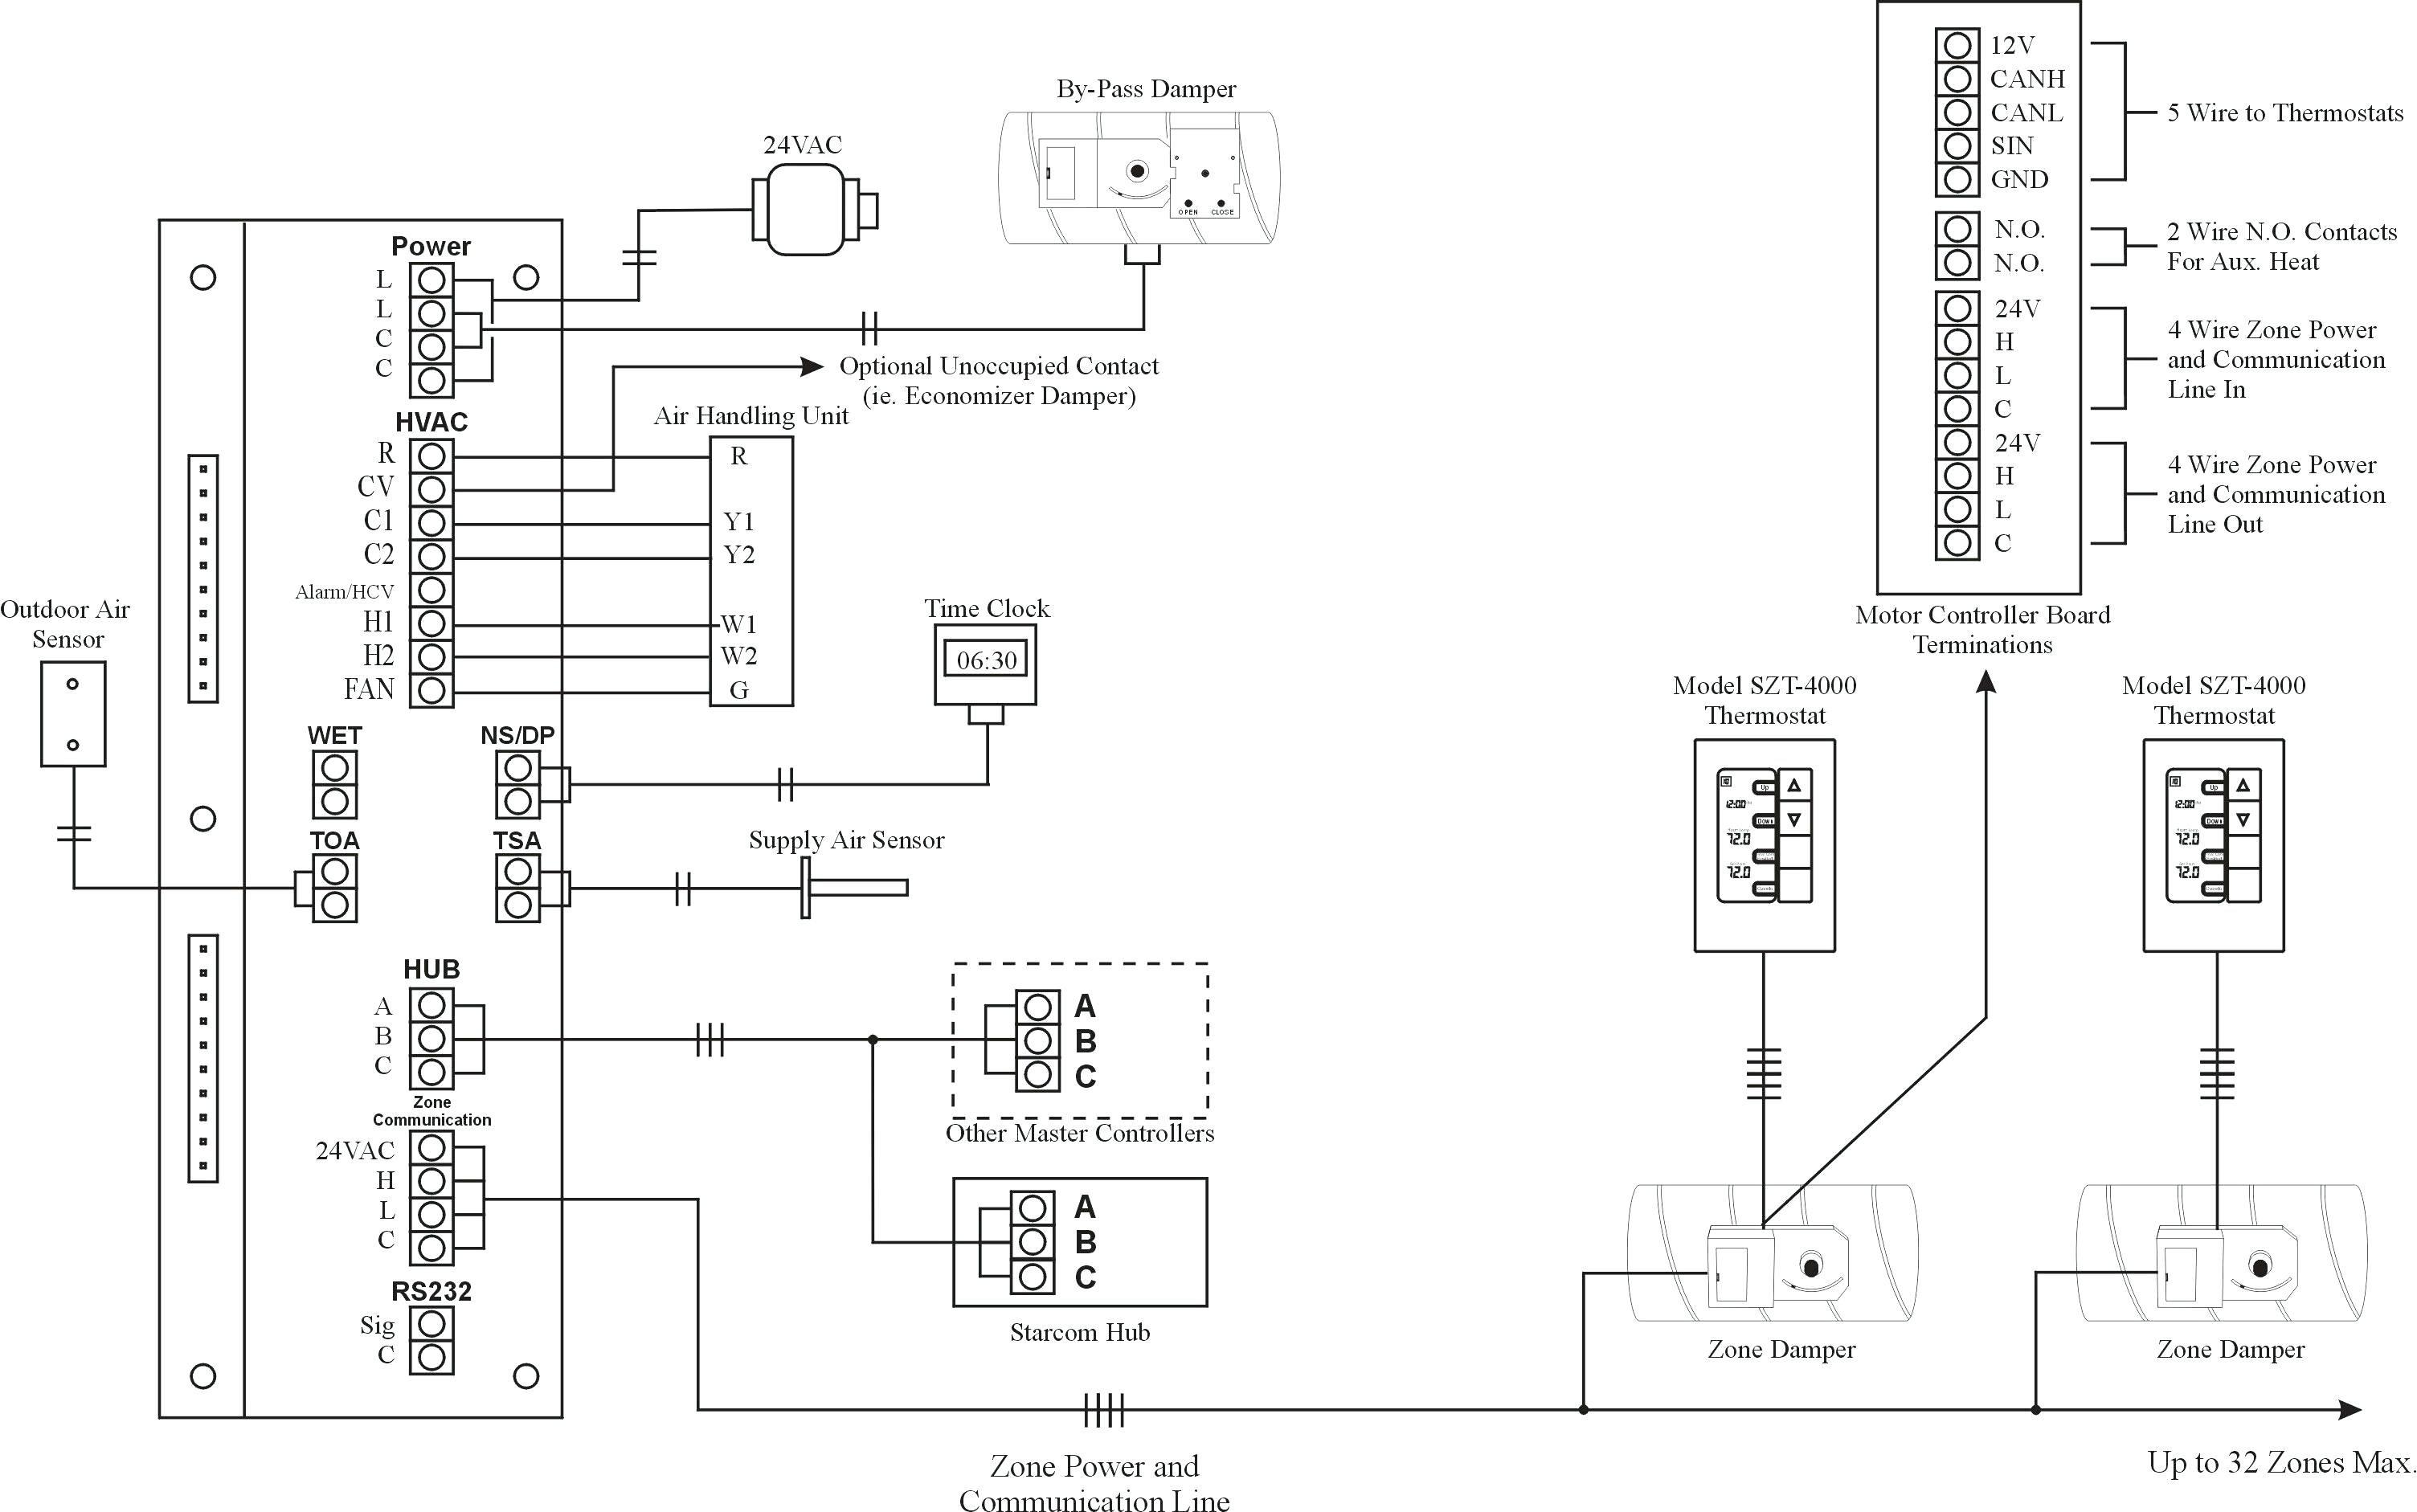 Heat Sensor Wiring Diagram | Wiring Diagram - Photocell Wiring Diagram